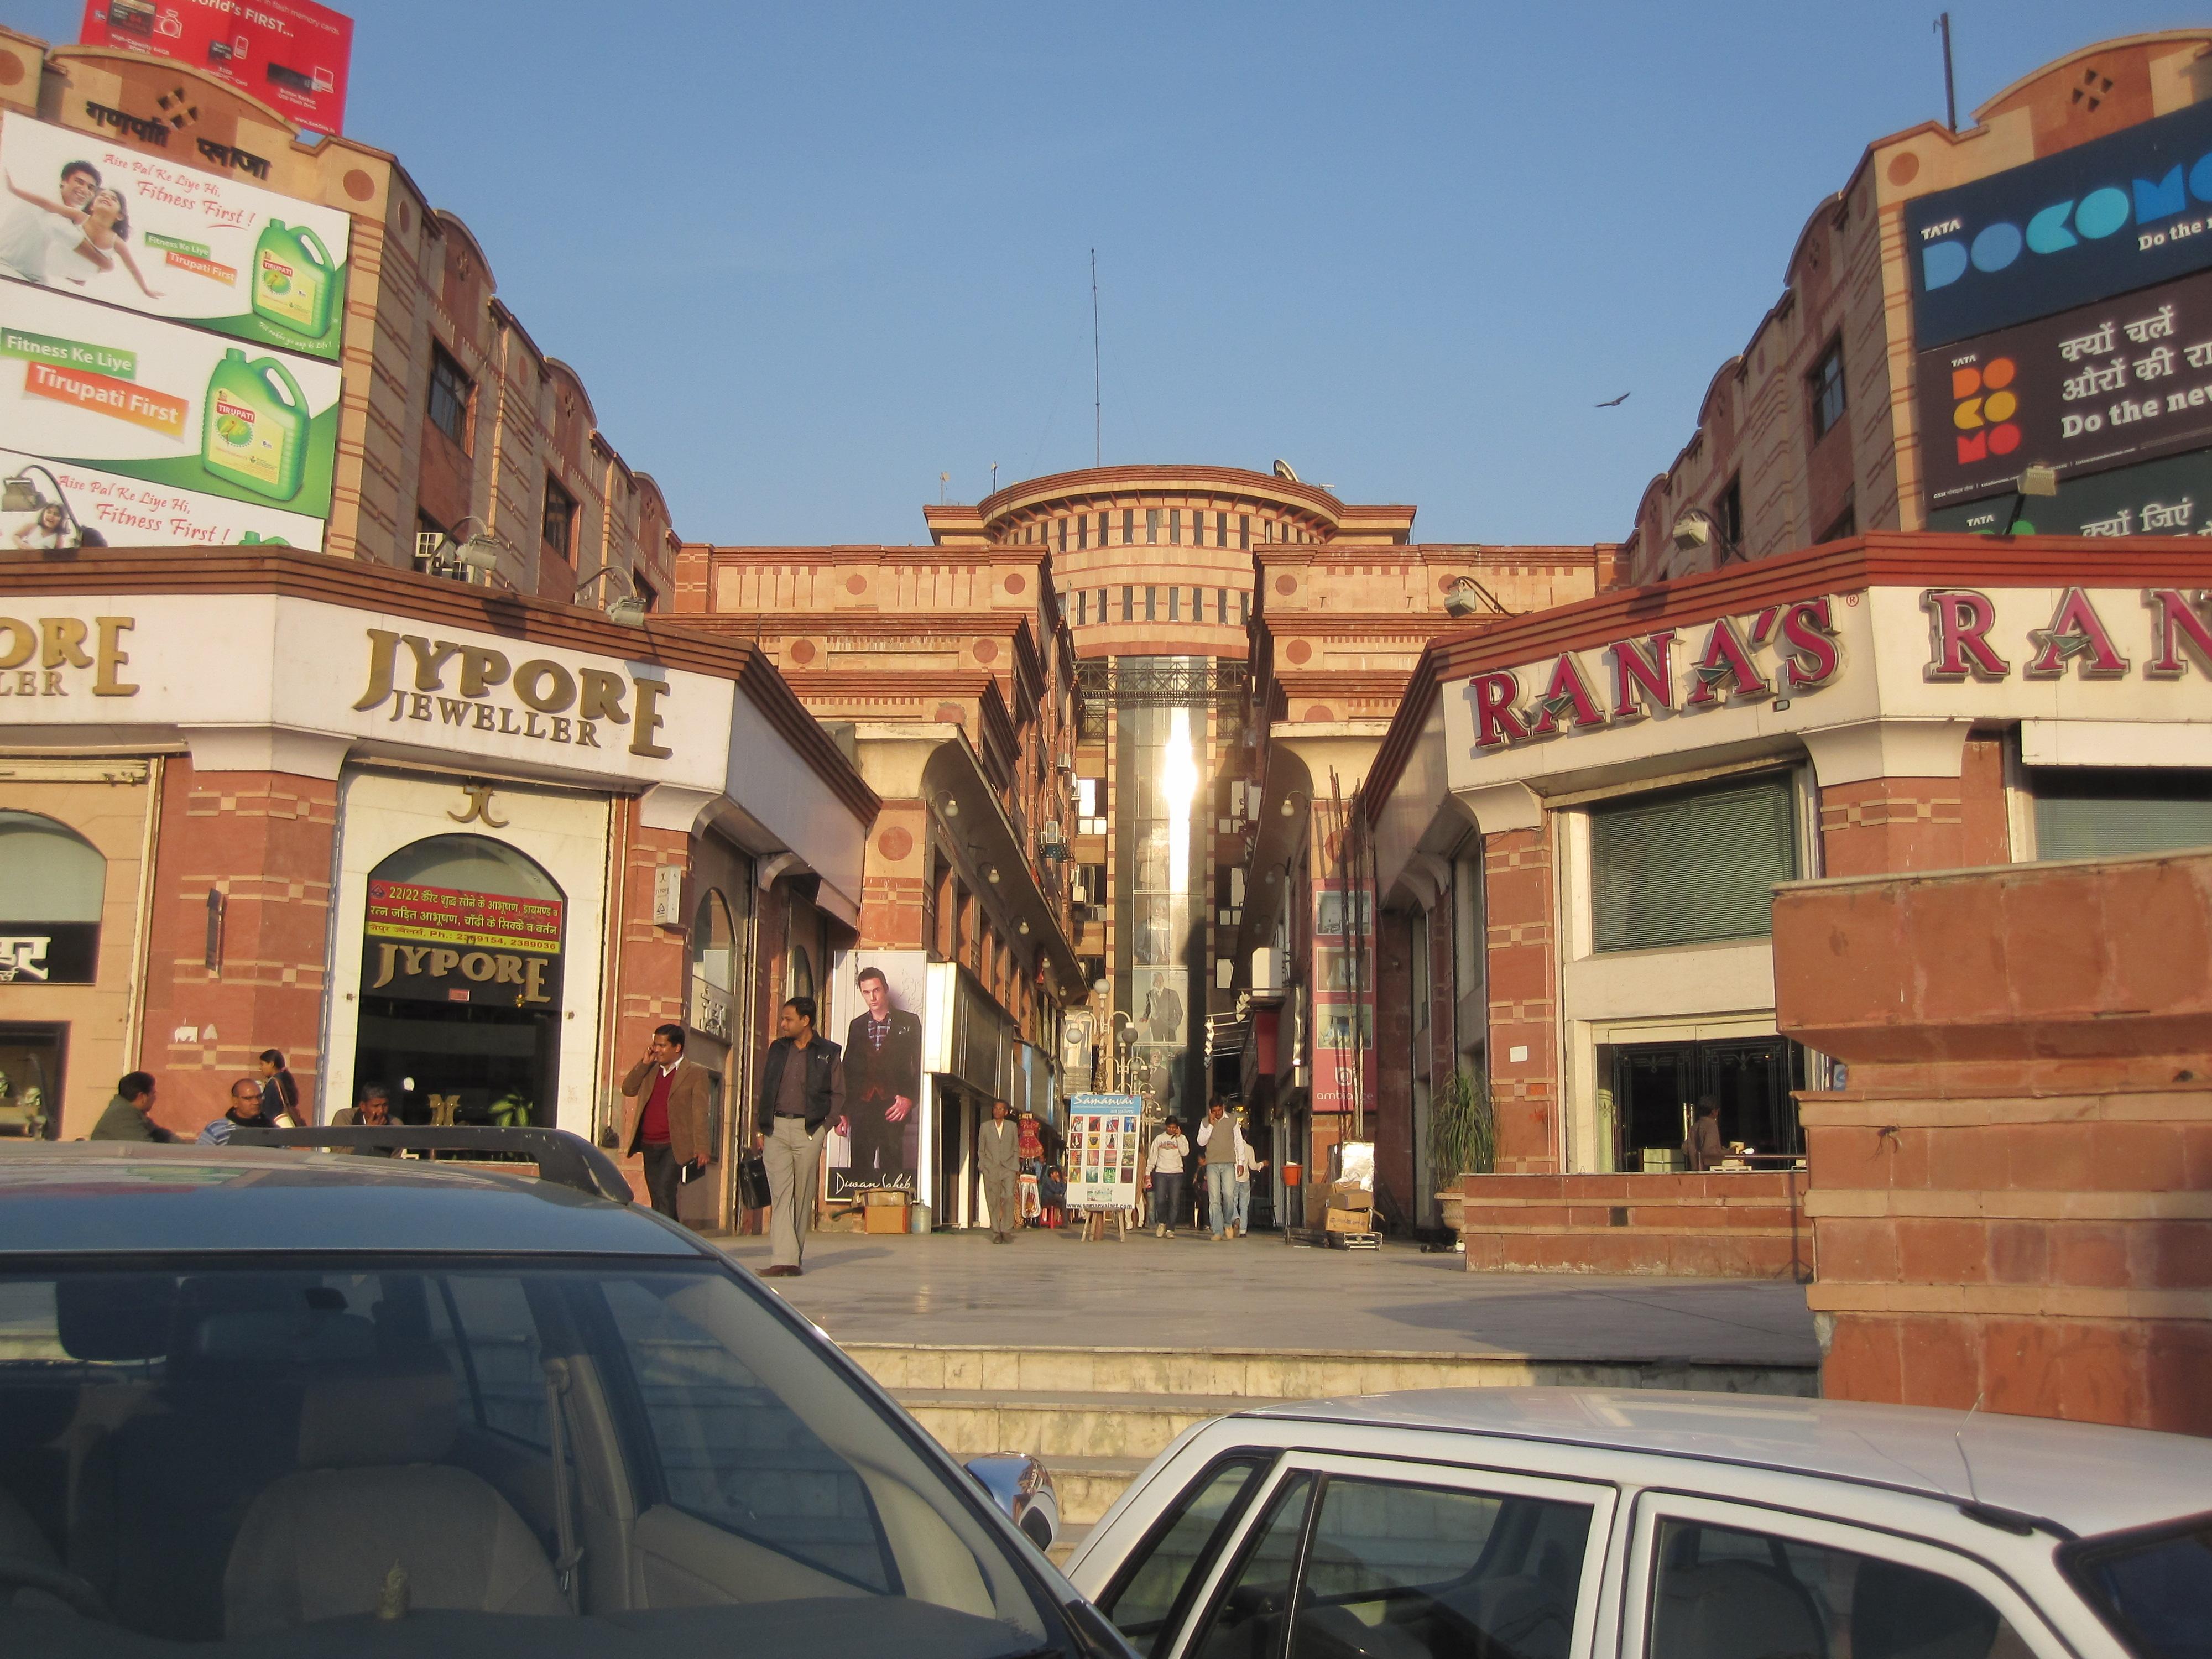 File:Shopping Mall, Jaipur.jpg - Wikimedia Commons